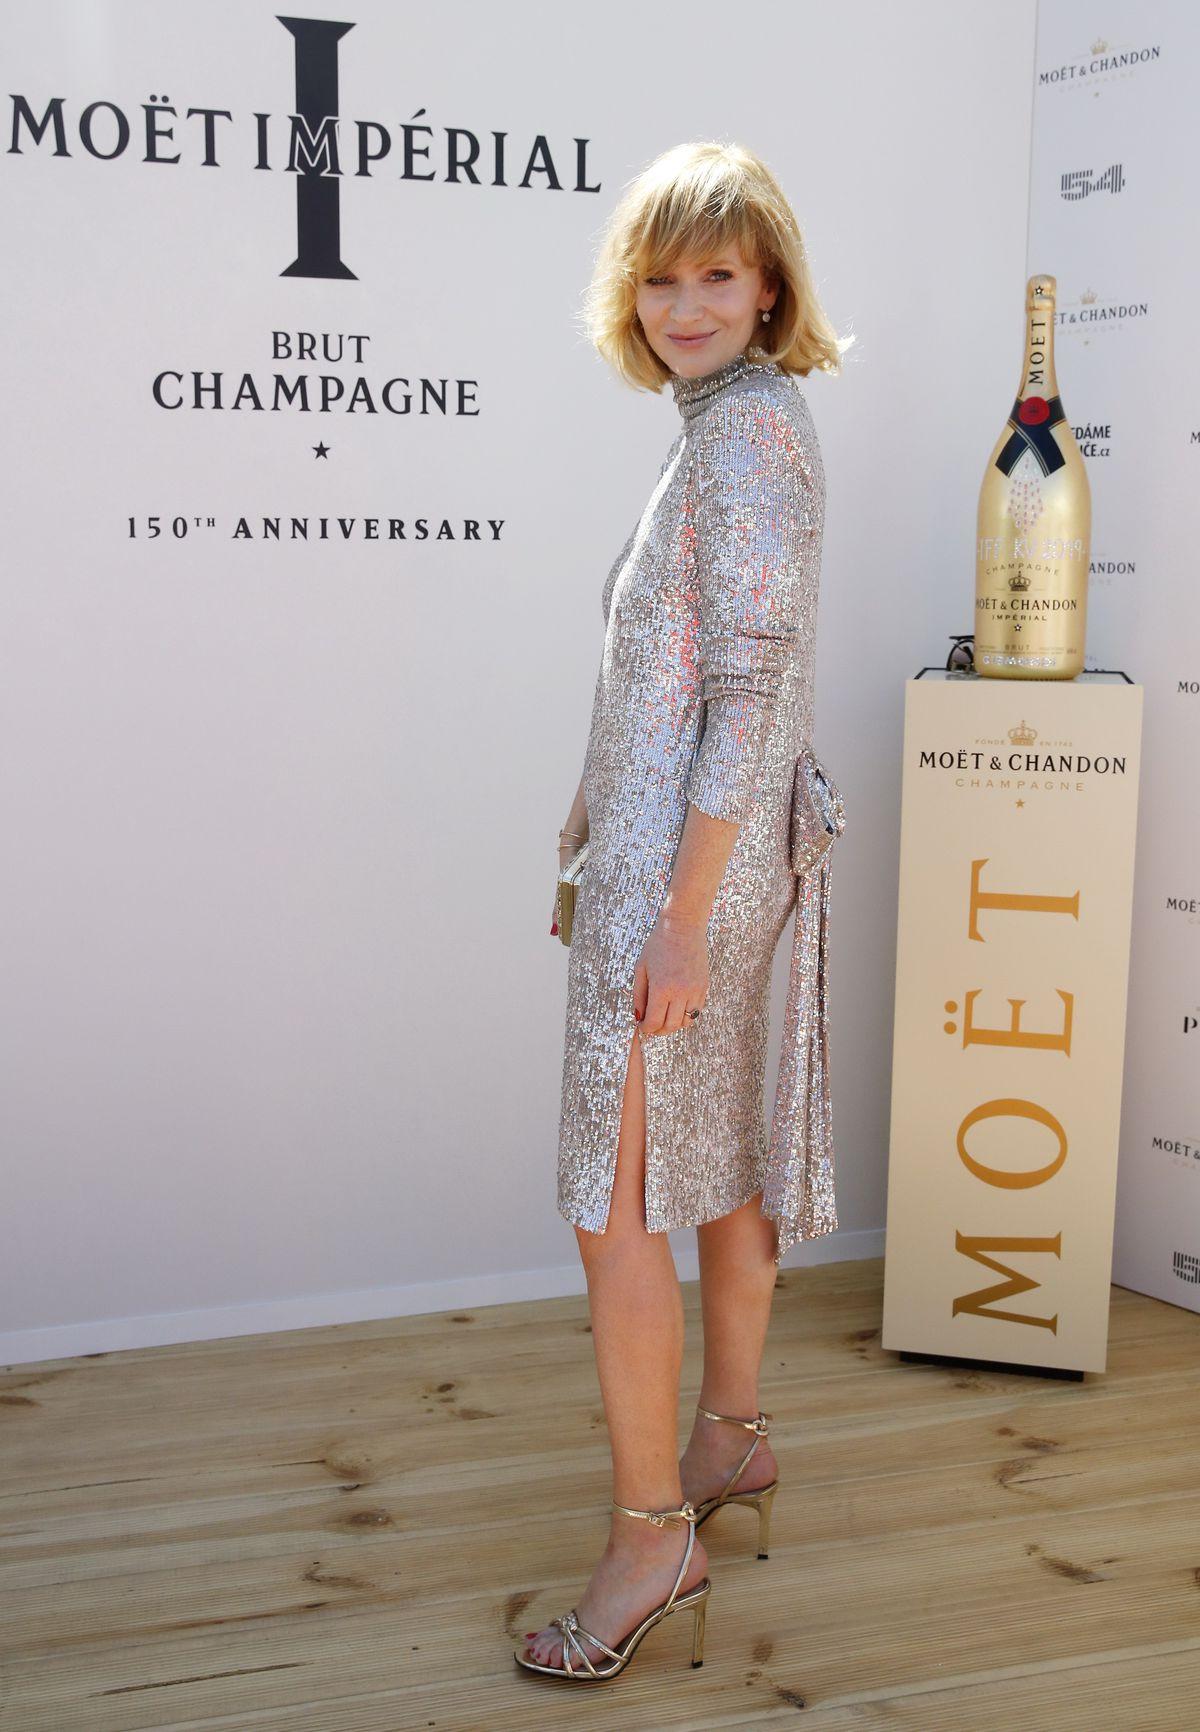 Na charitatívnej akcii značky šampanského Moët...